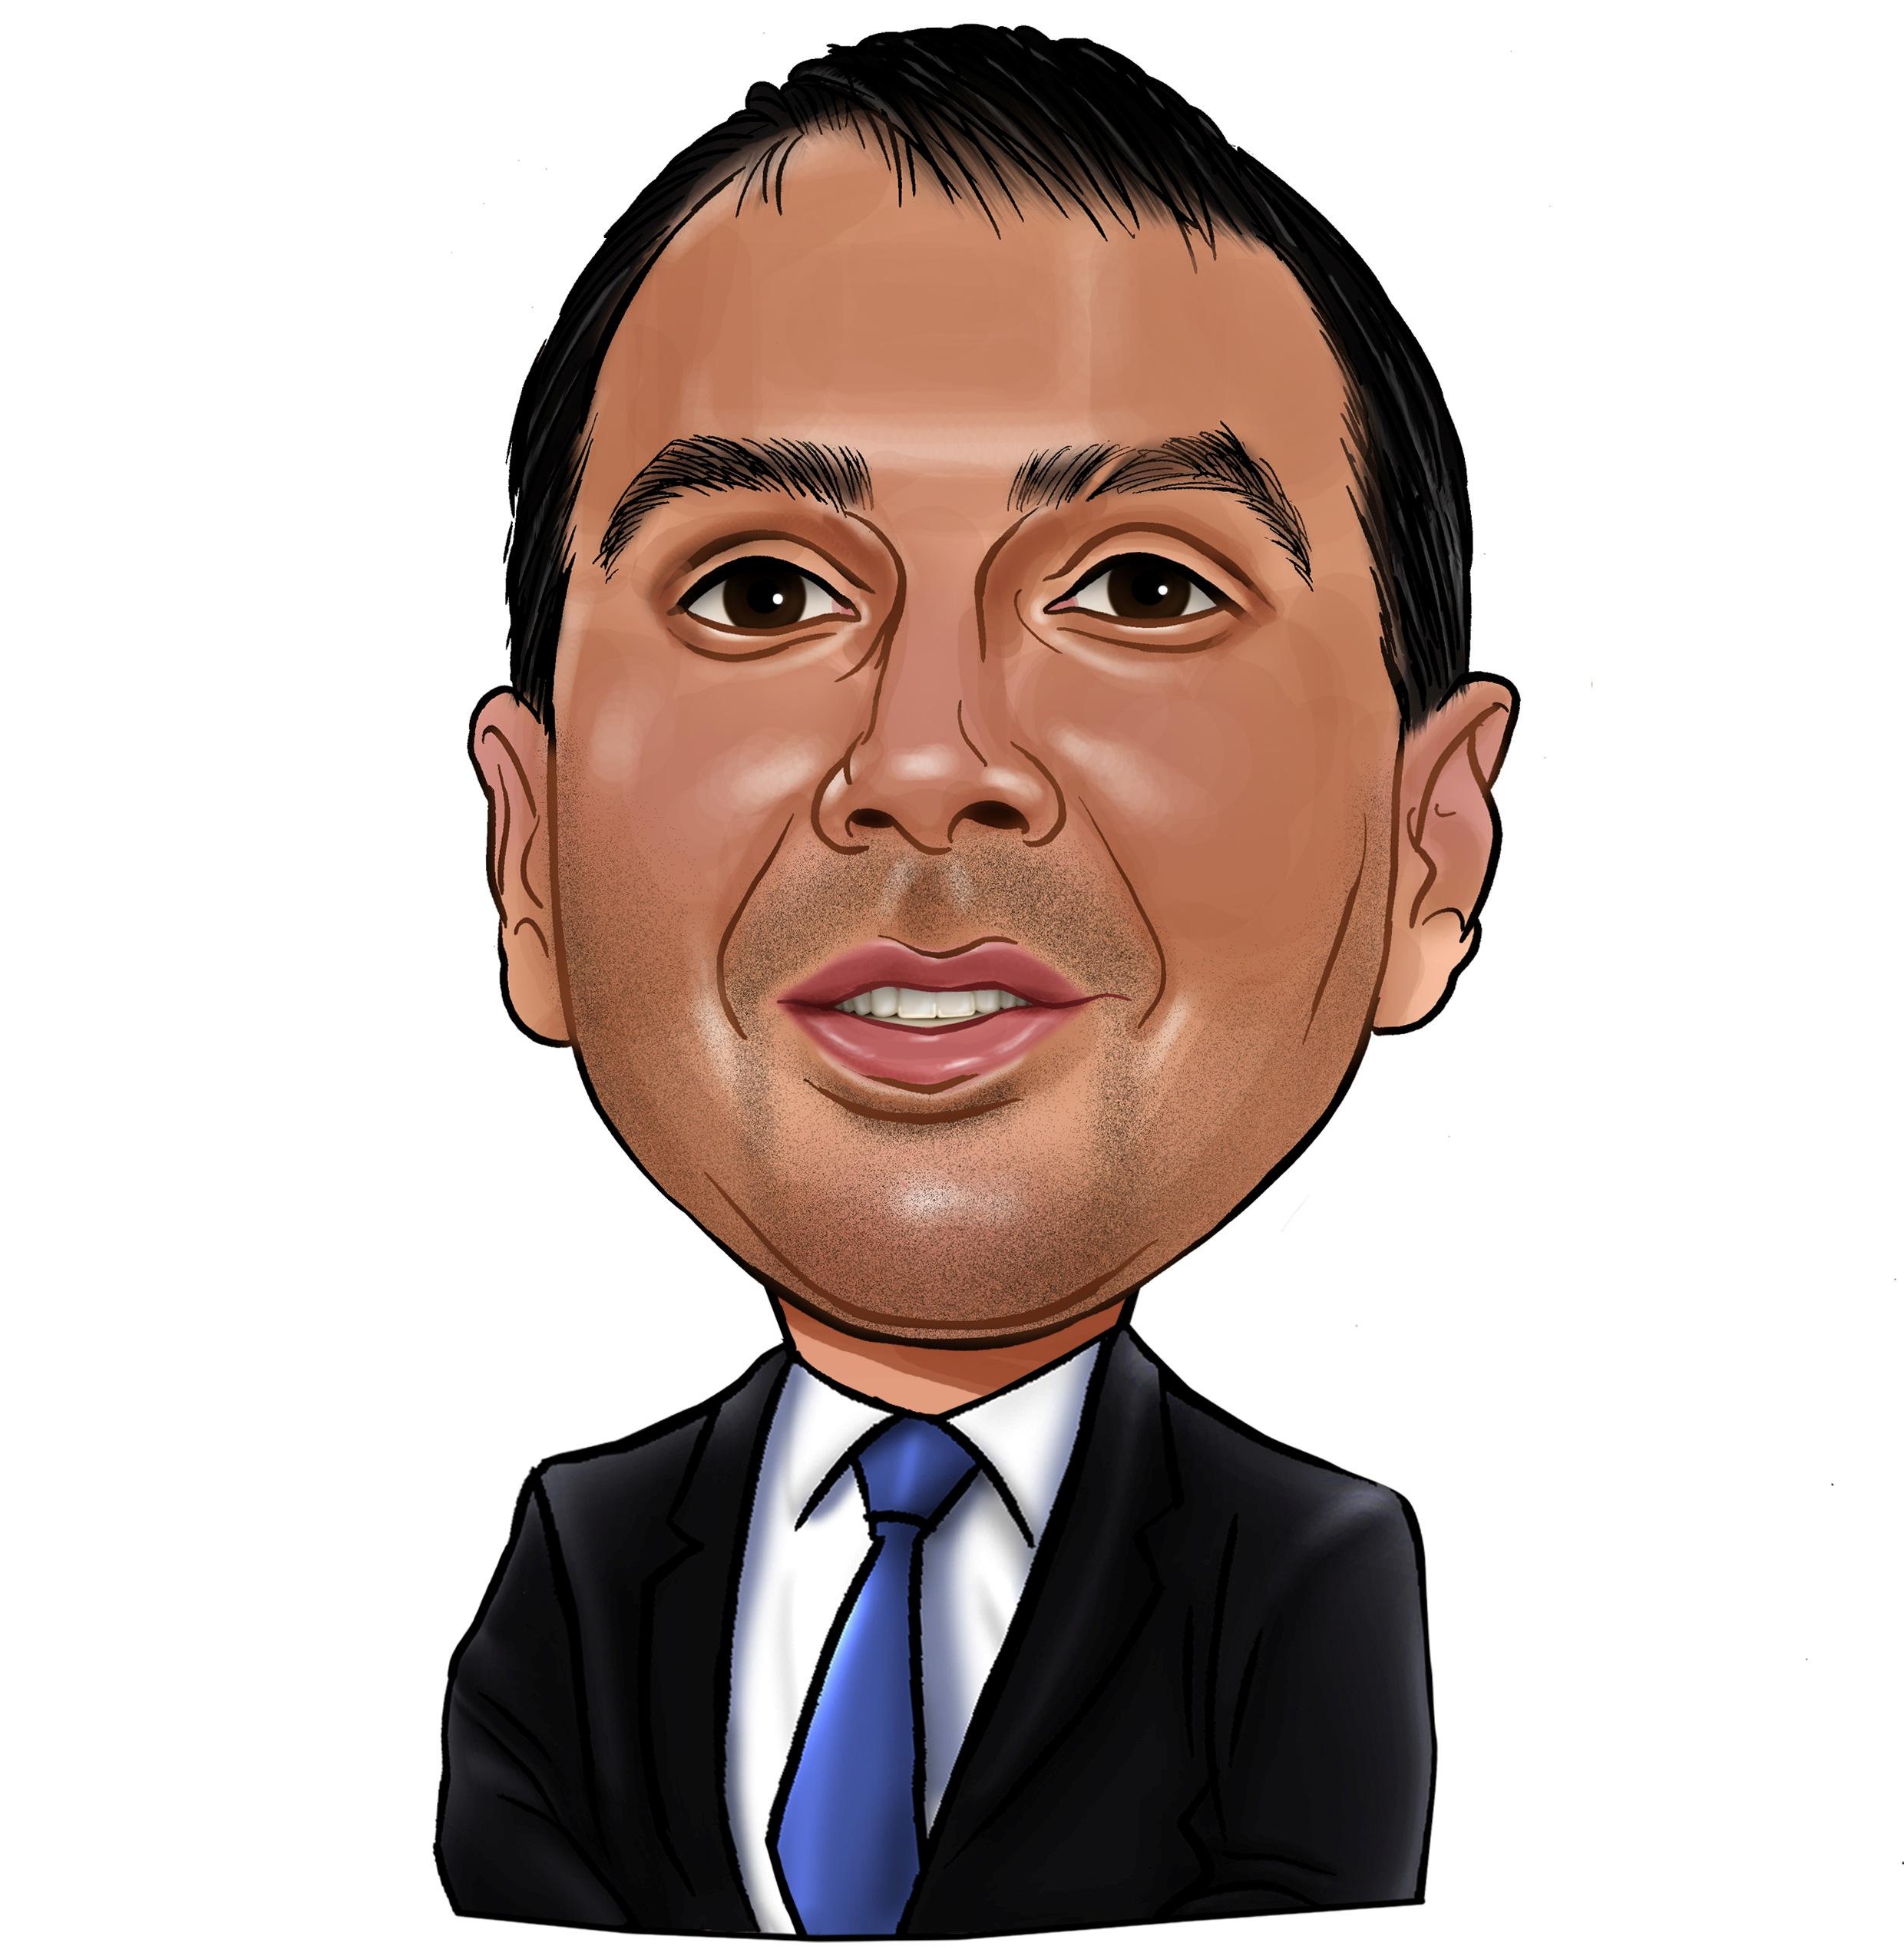 michael novogratz fortress investment group 2017 stock picks hedge funds latest moves diamondback energy inc fang walker dunlop